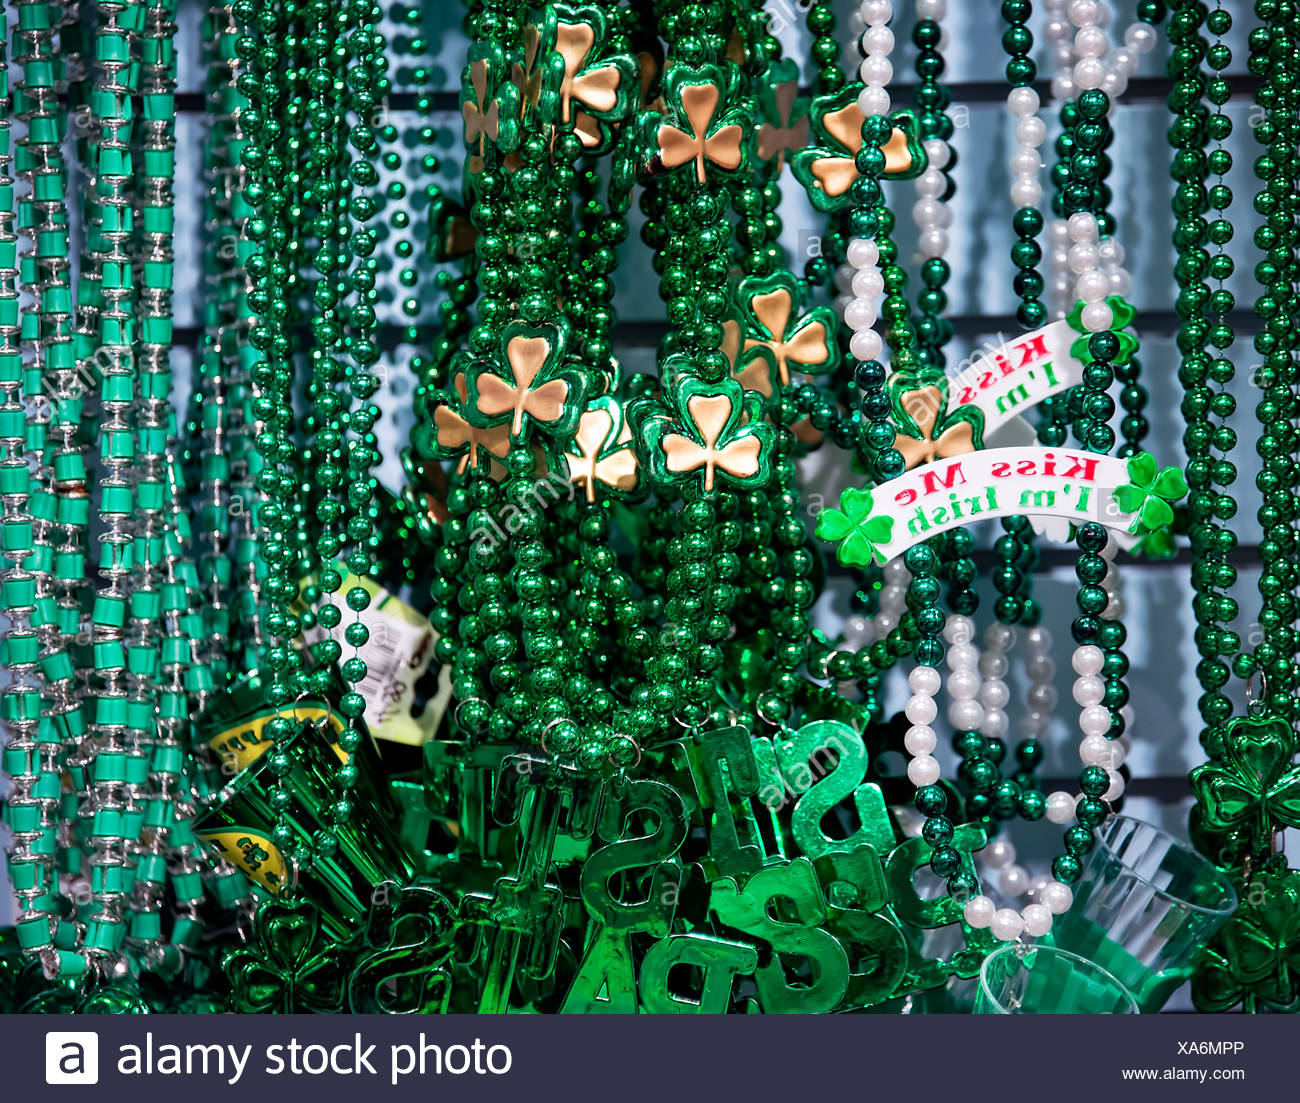 St Patrick's Day trinkets. - Stock Image